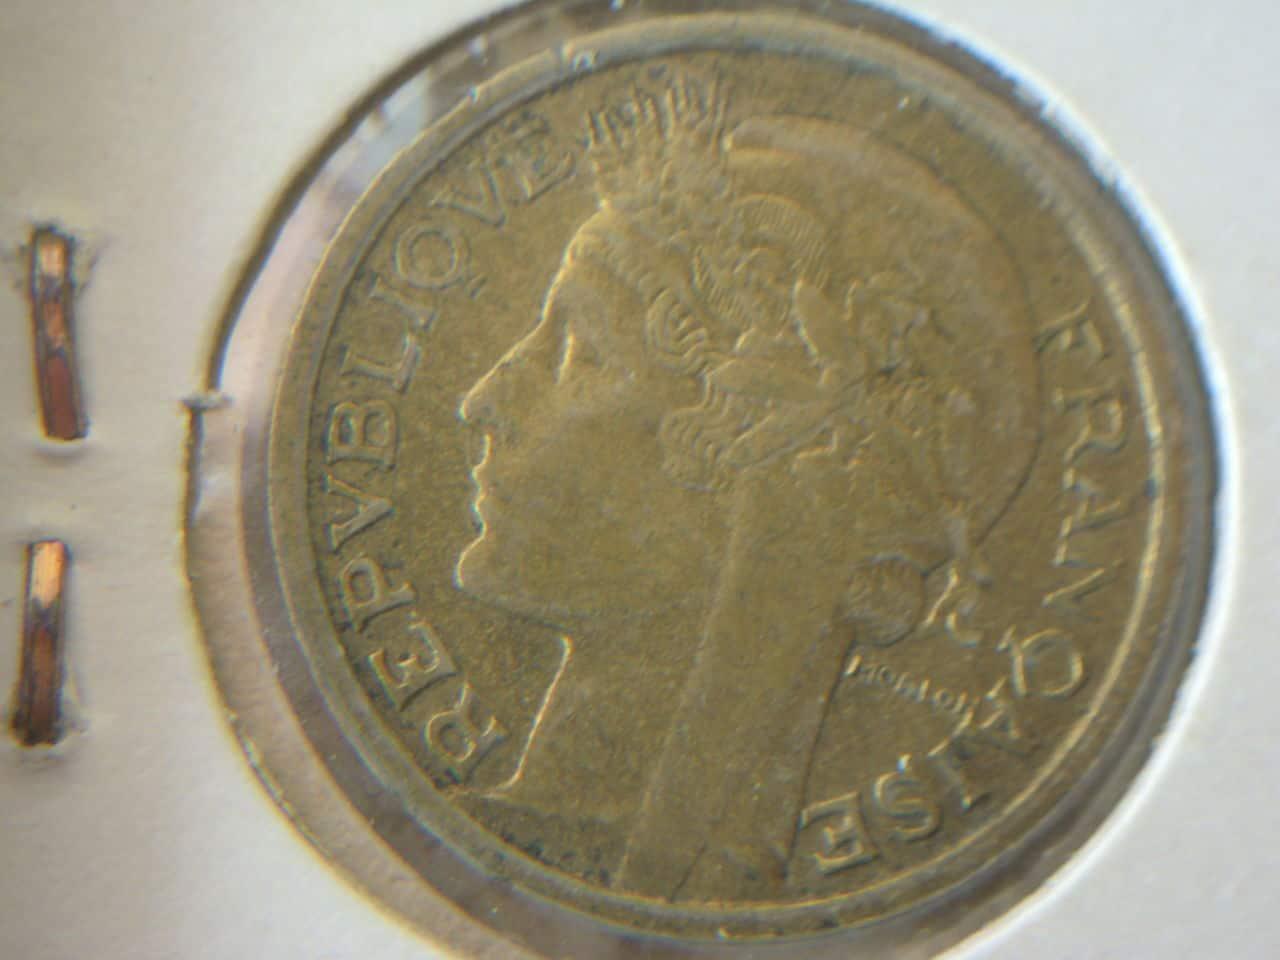 50 cents. Francia 1939 Ceca? DSCN0888